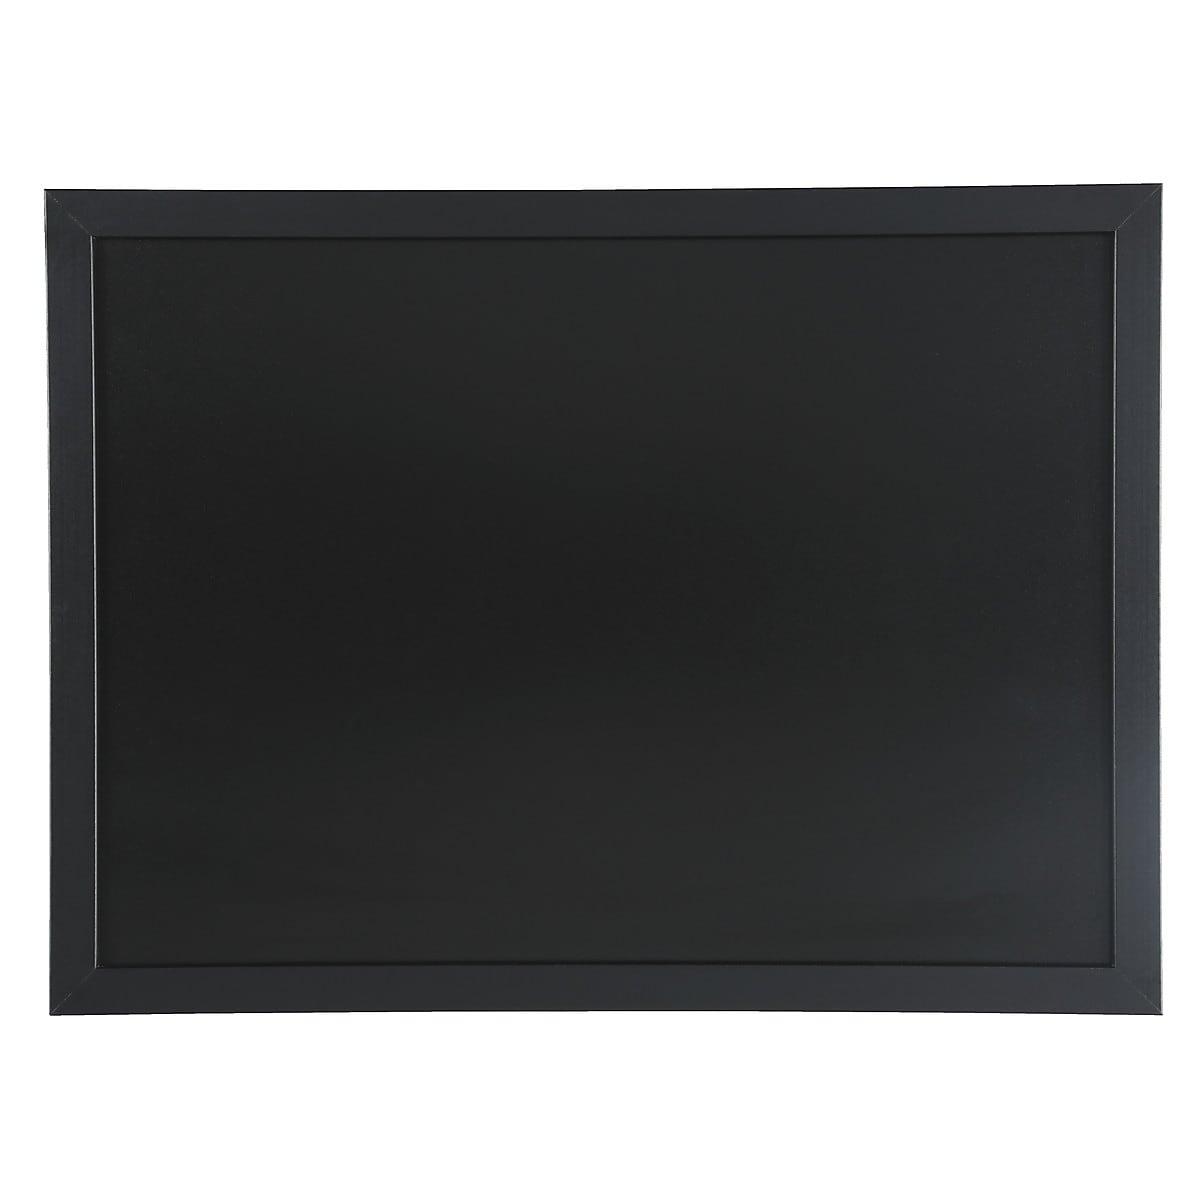 Griffeltavla 585 x 433 cm